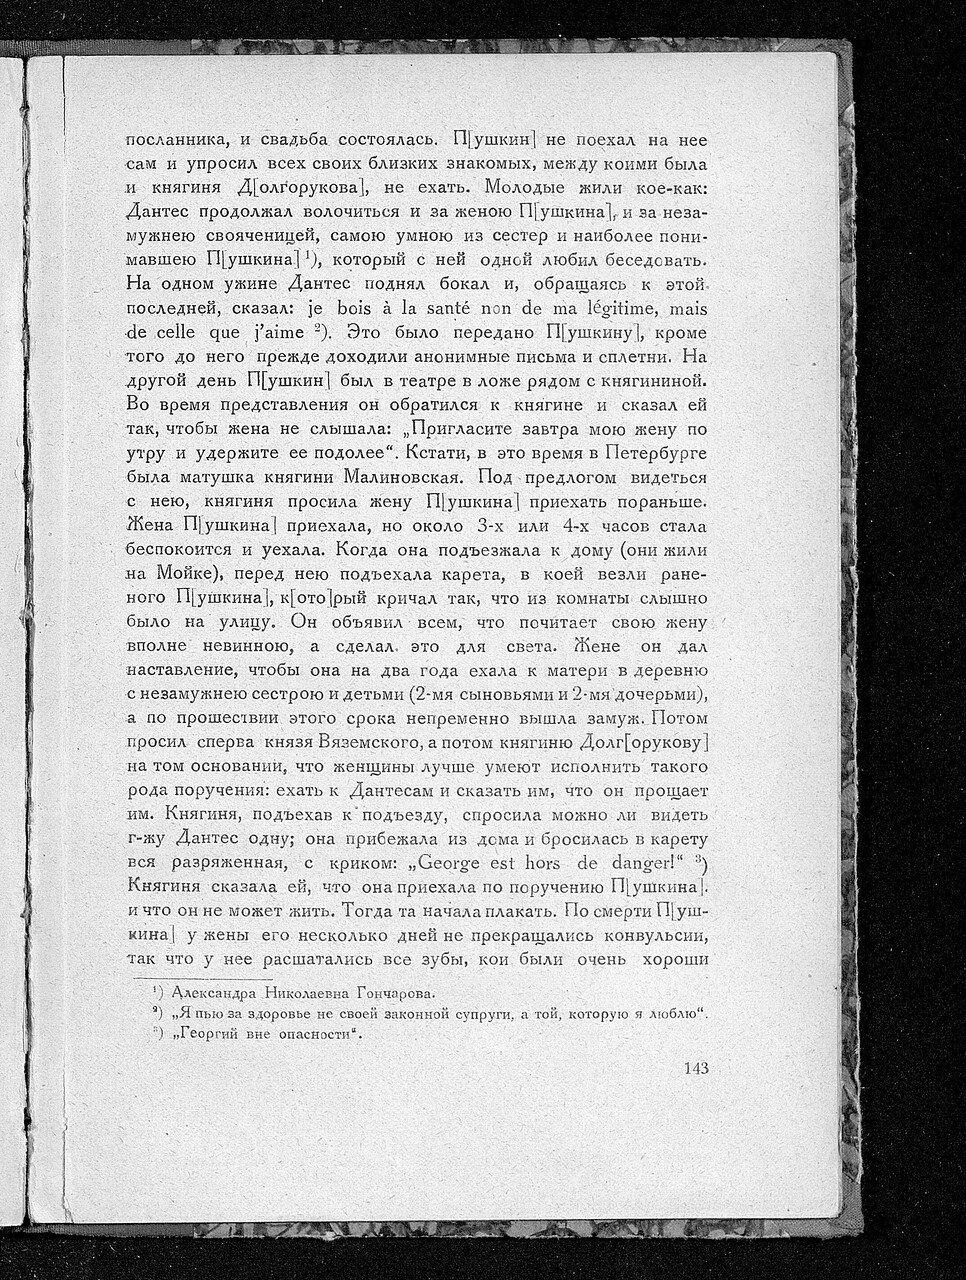 https://img-fotki.yandex.ru/get/892397/199368979.a2/0_214389_841144e_XXXL.jpg